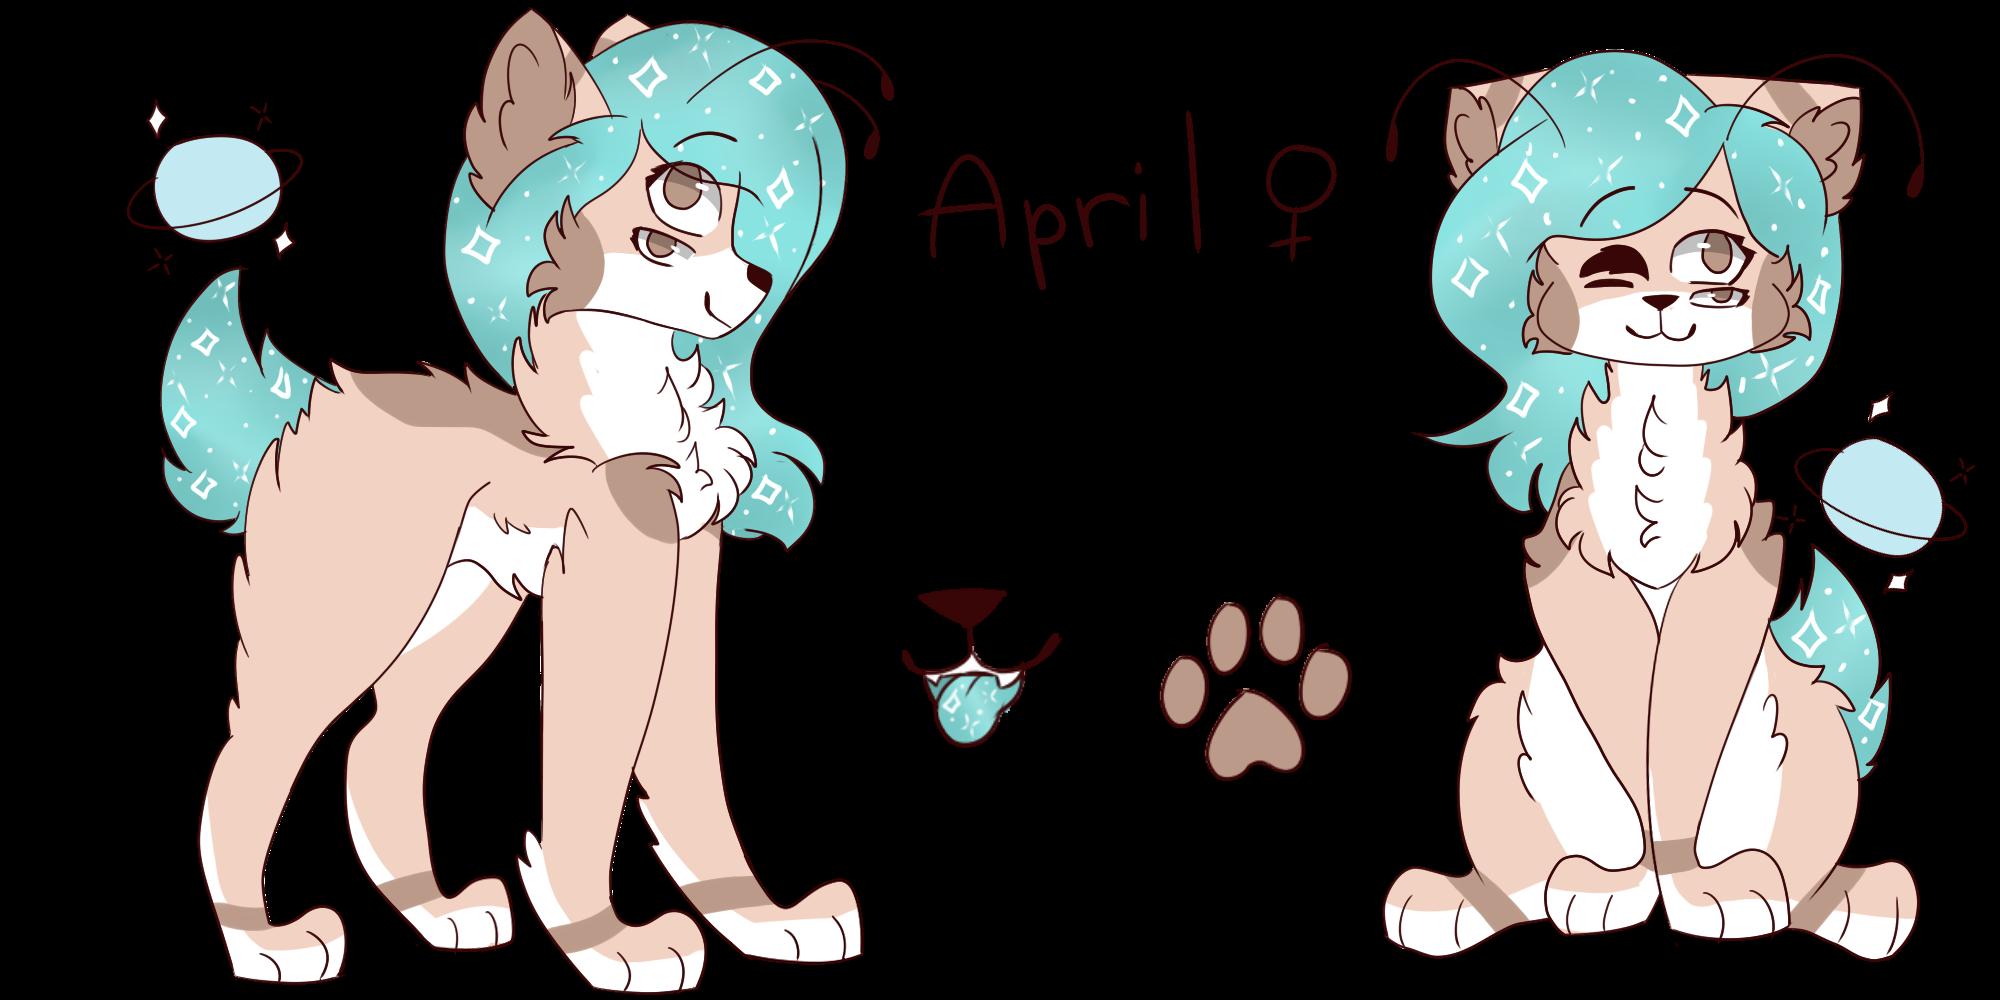 April ref by CutieCakie